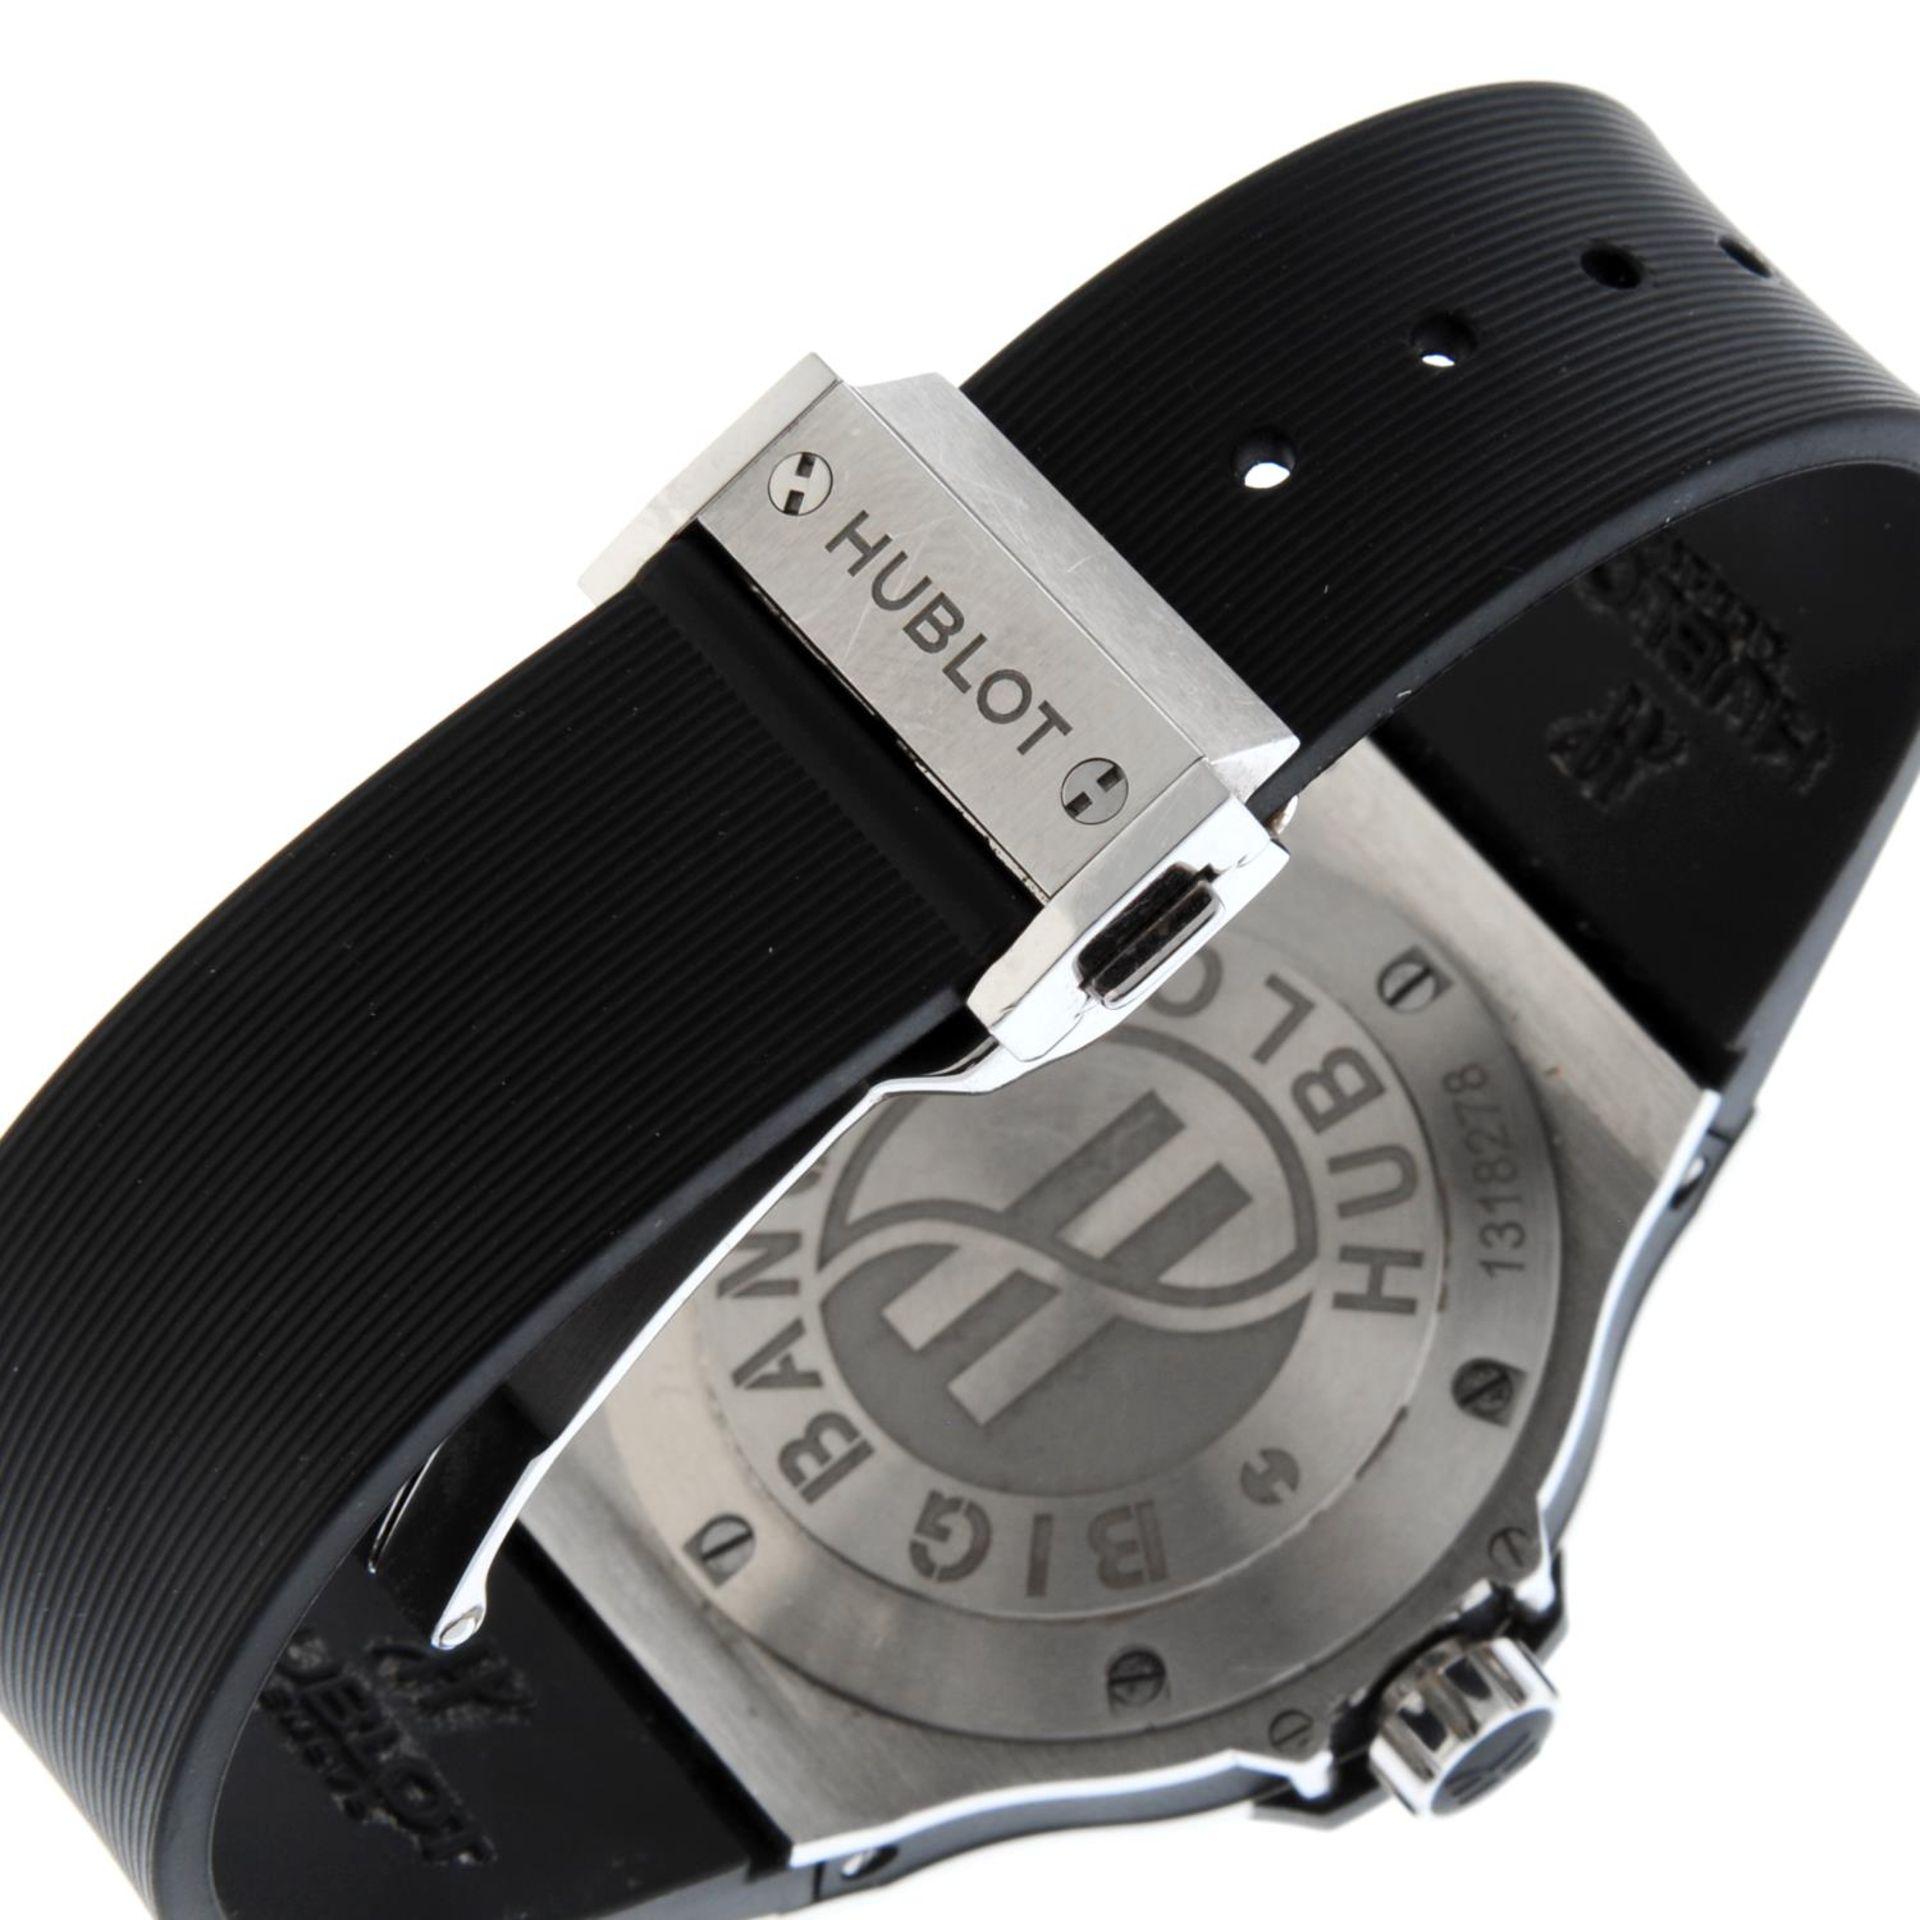 HUBLOT - a Big Bang wrist watch. - Bild 2 aus 6